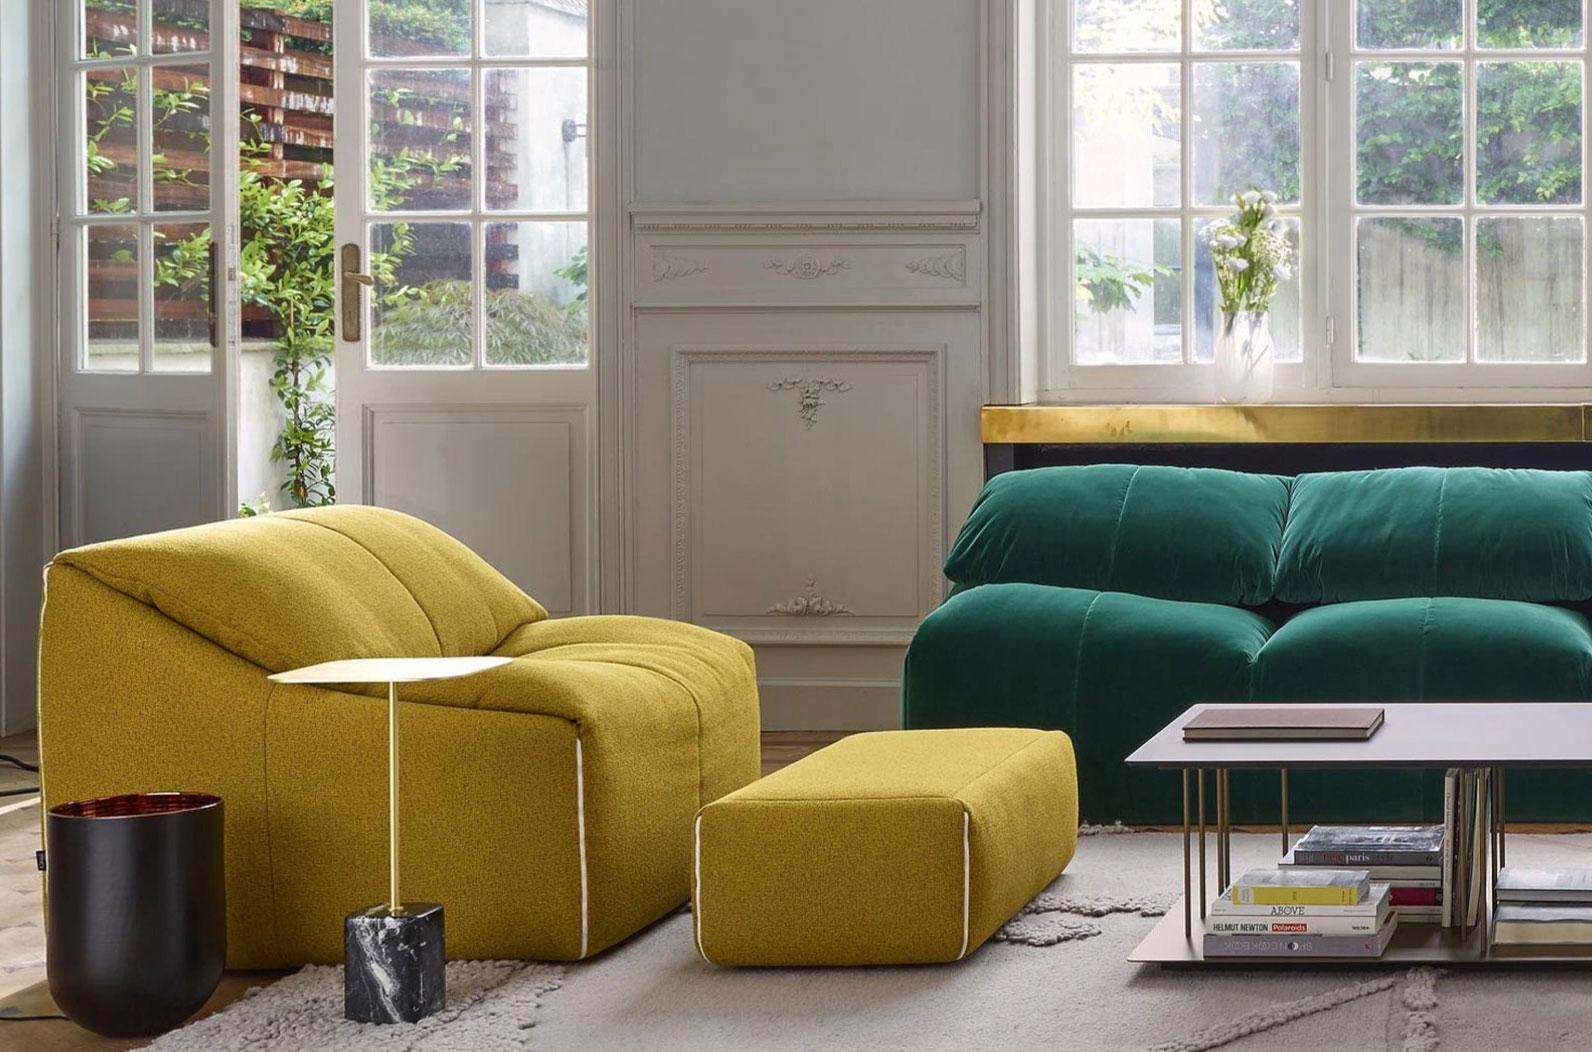 ligne roset plumy-sofa